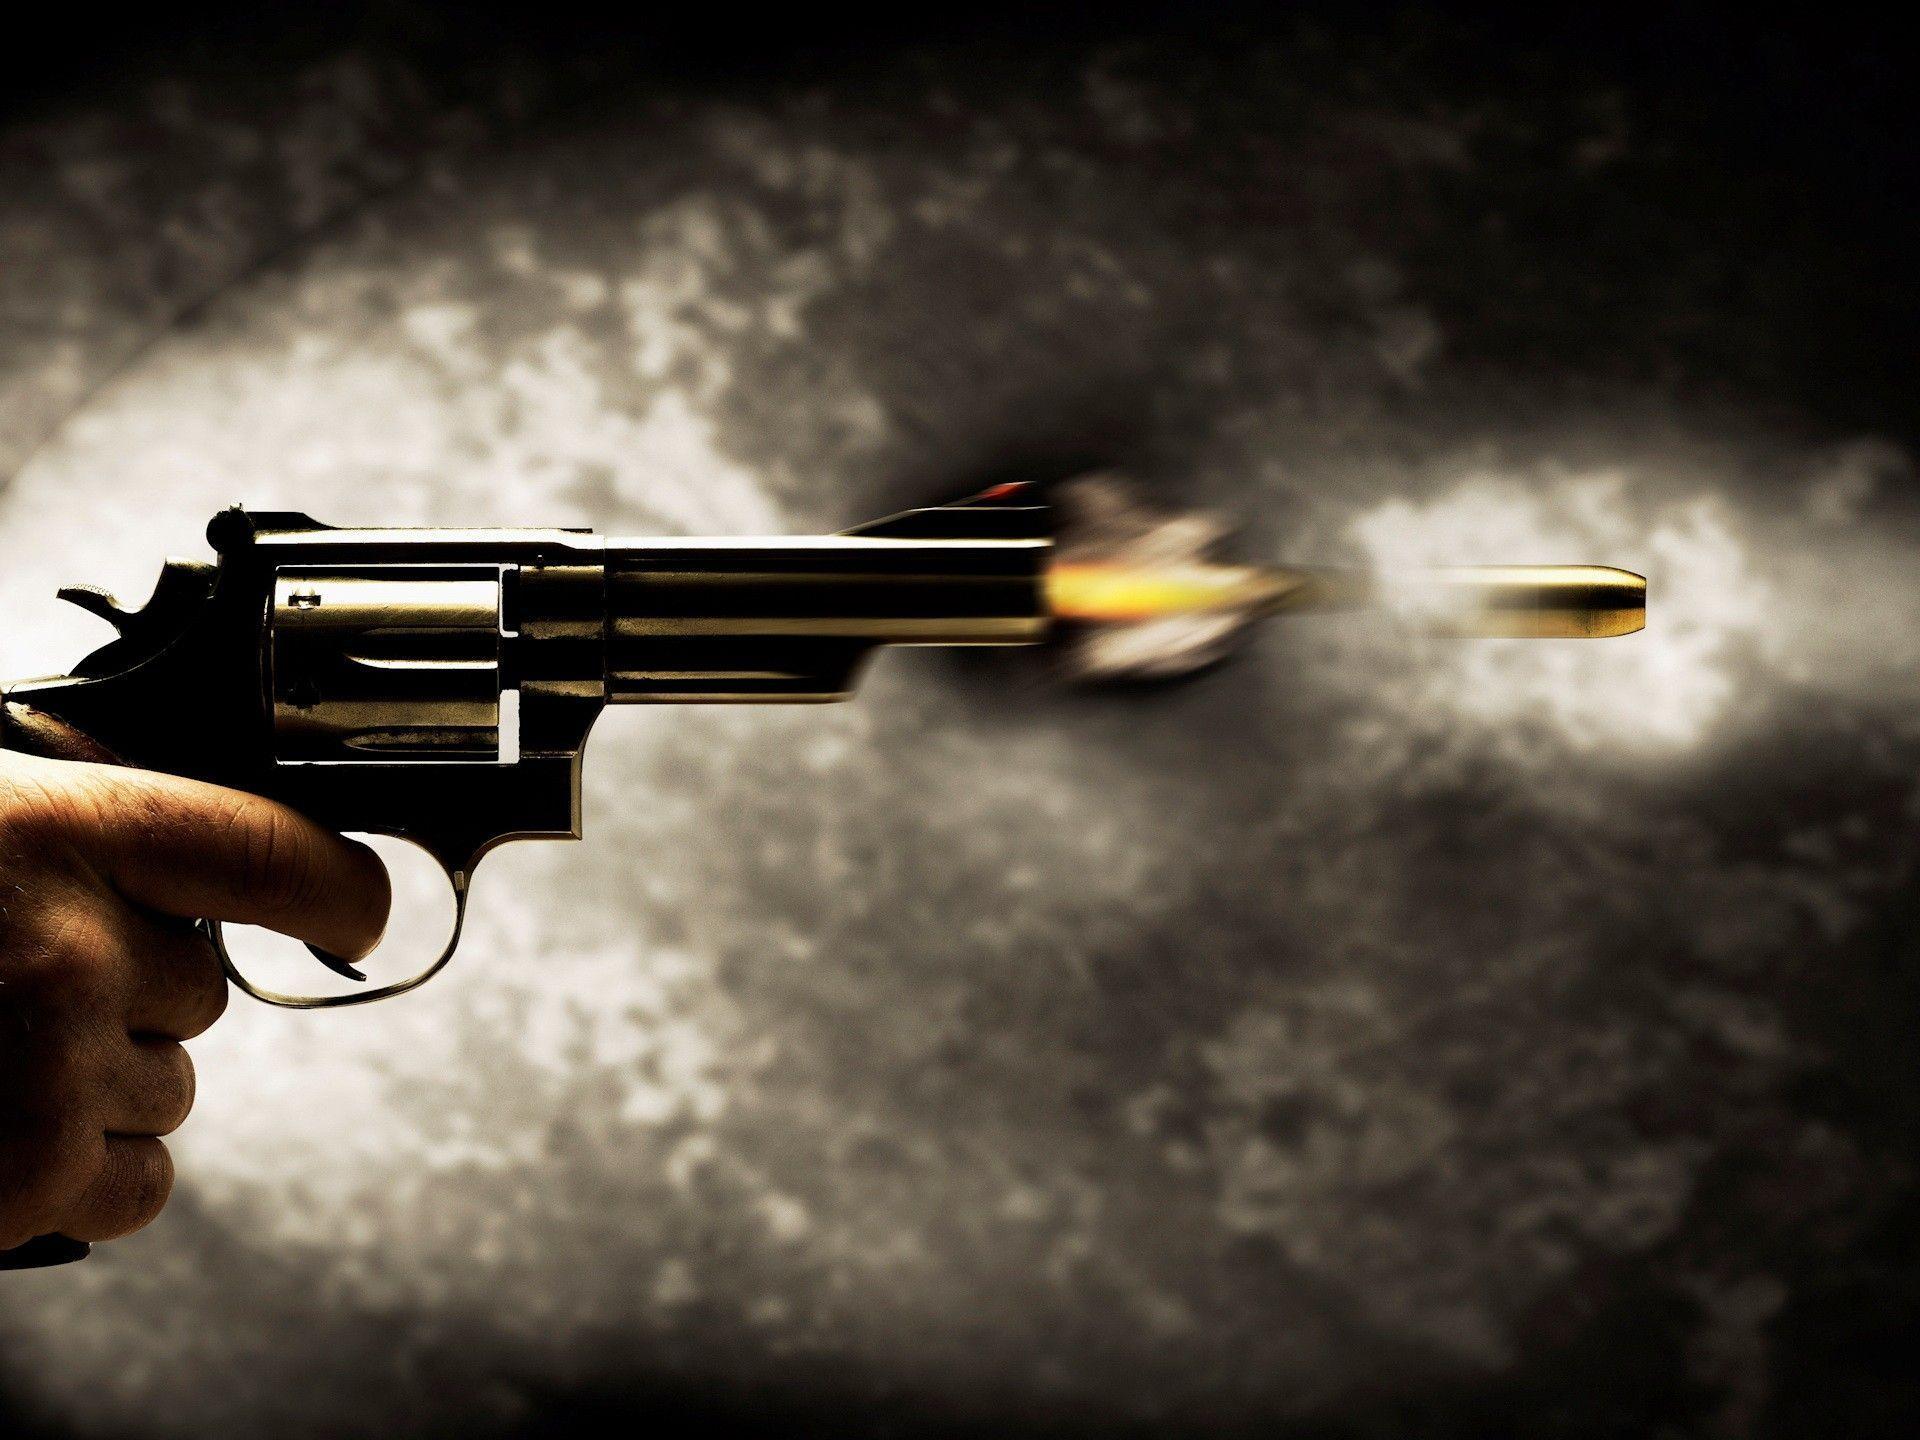 fotos gun bullet - photo #14